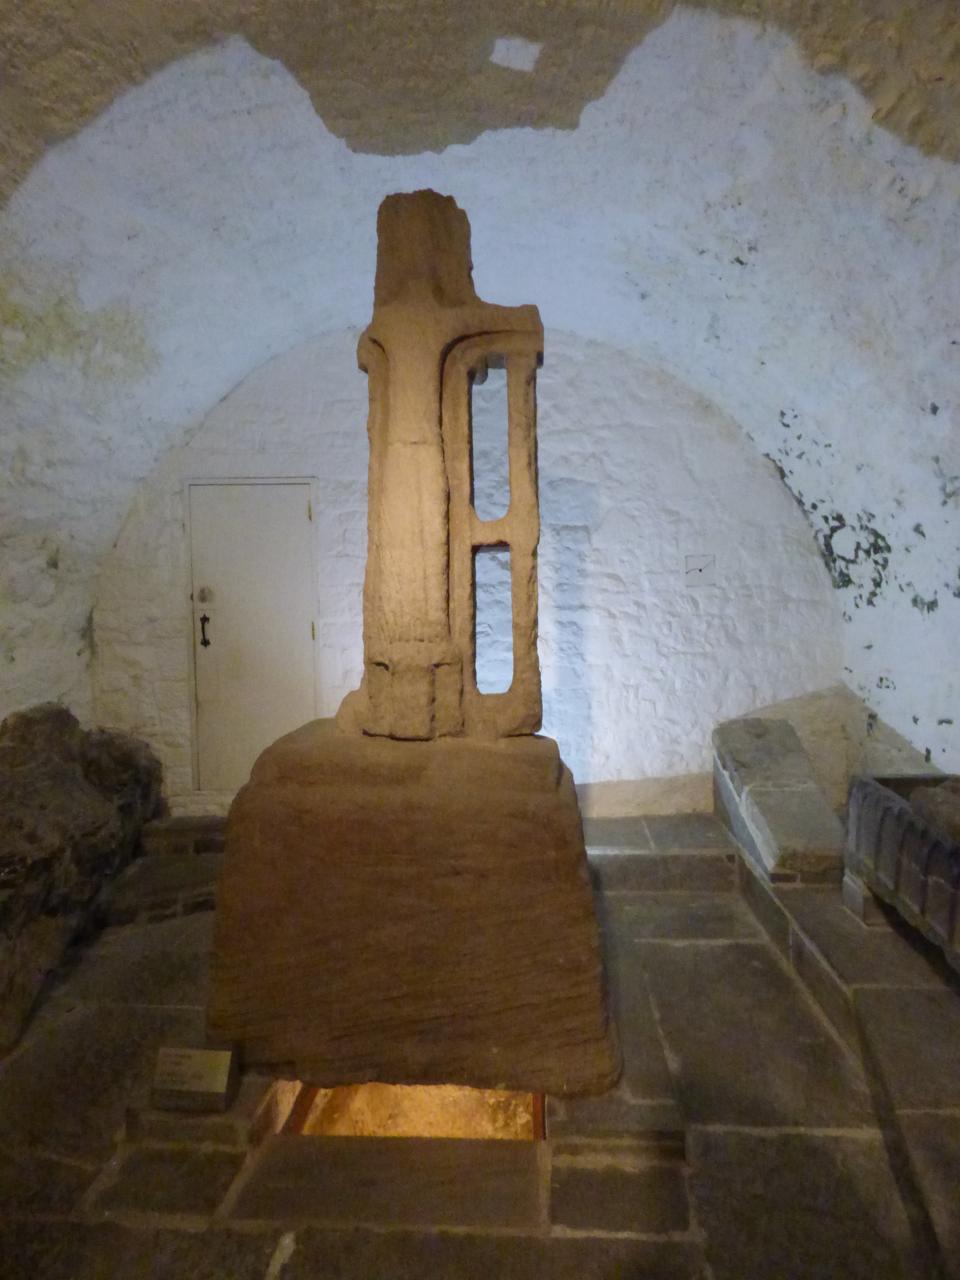 Latin Cross Rock of Cashel St. Patrick's Cross